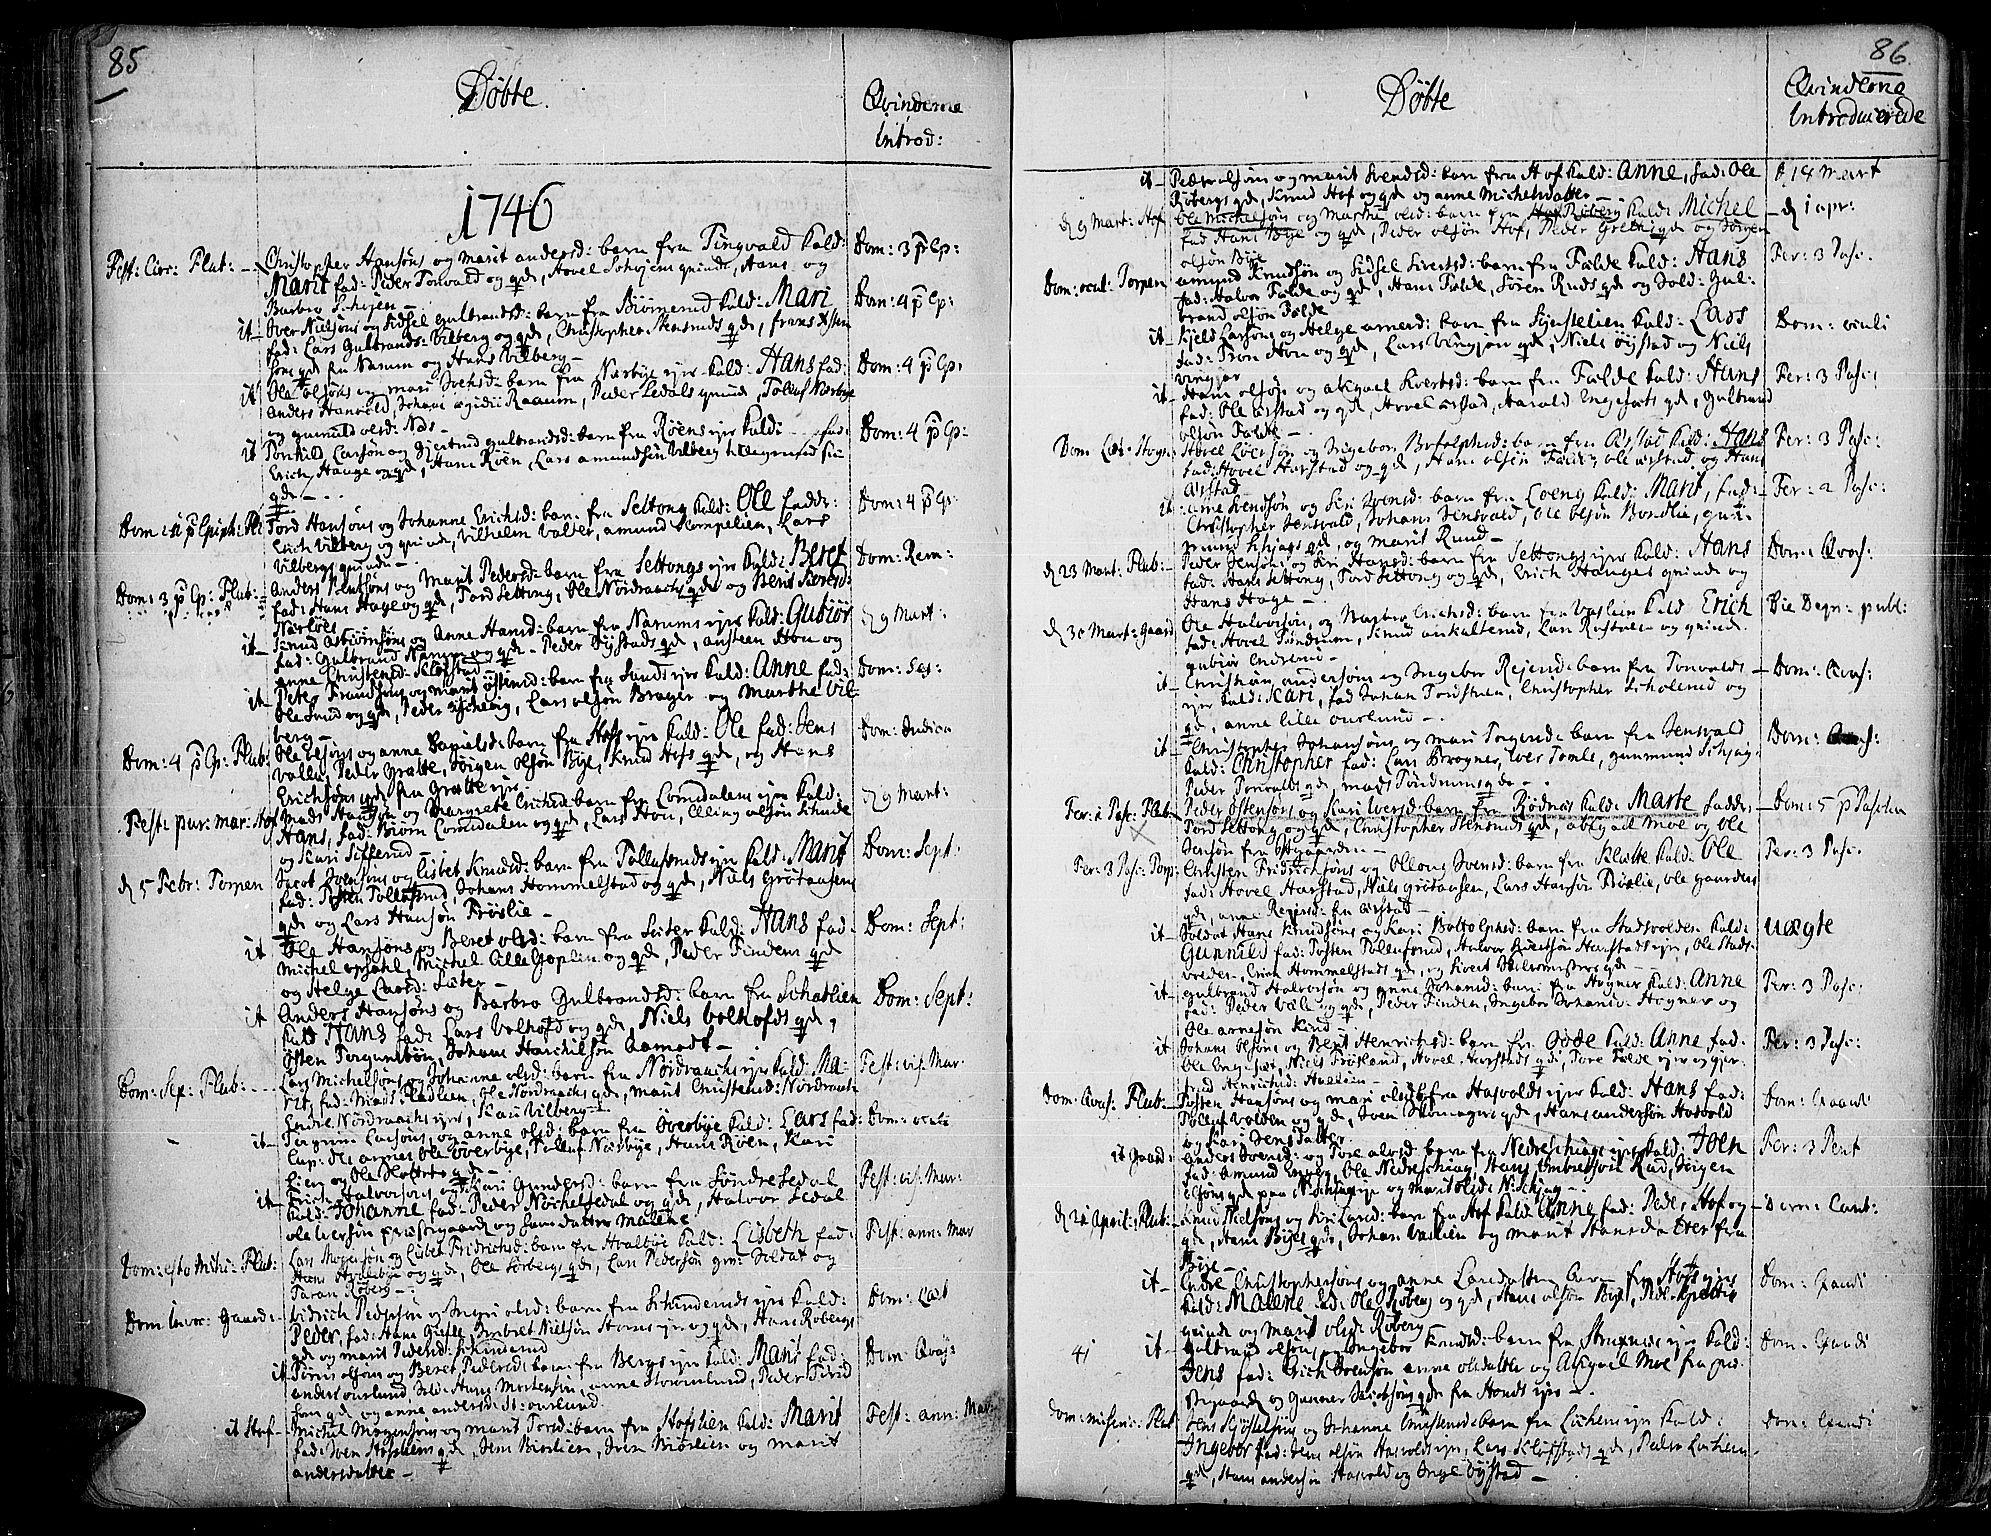 SAH, Land prestekontor, Ministerialbok nr. 2, 1733-1764, s. 85-86